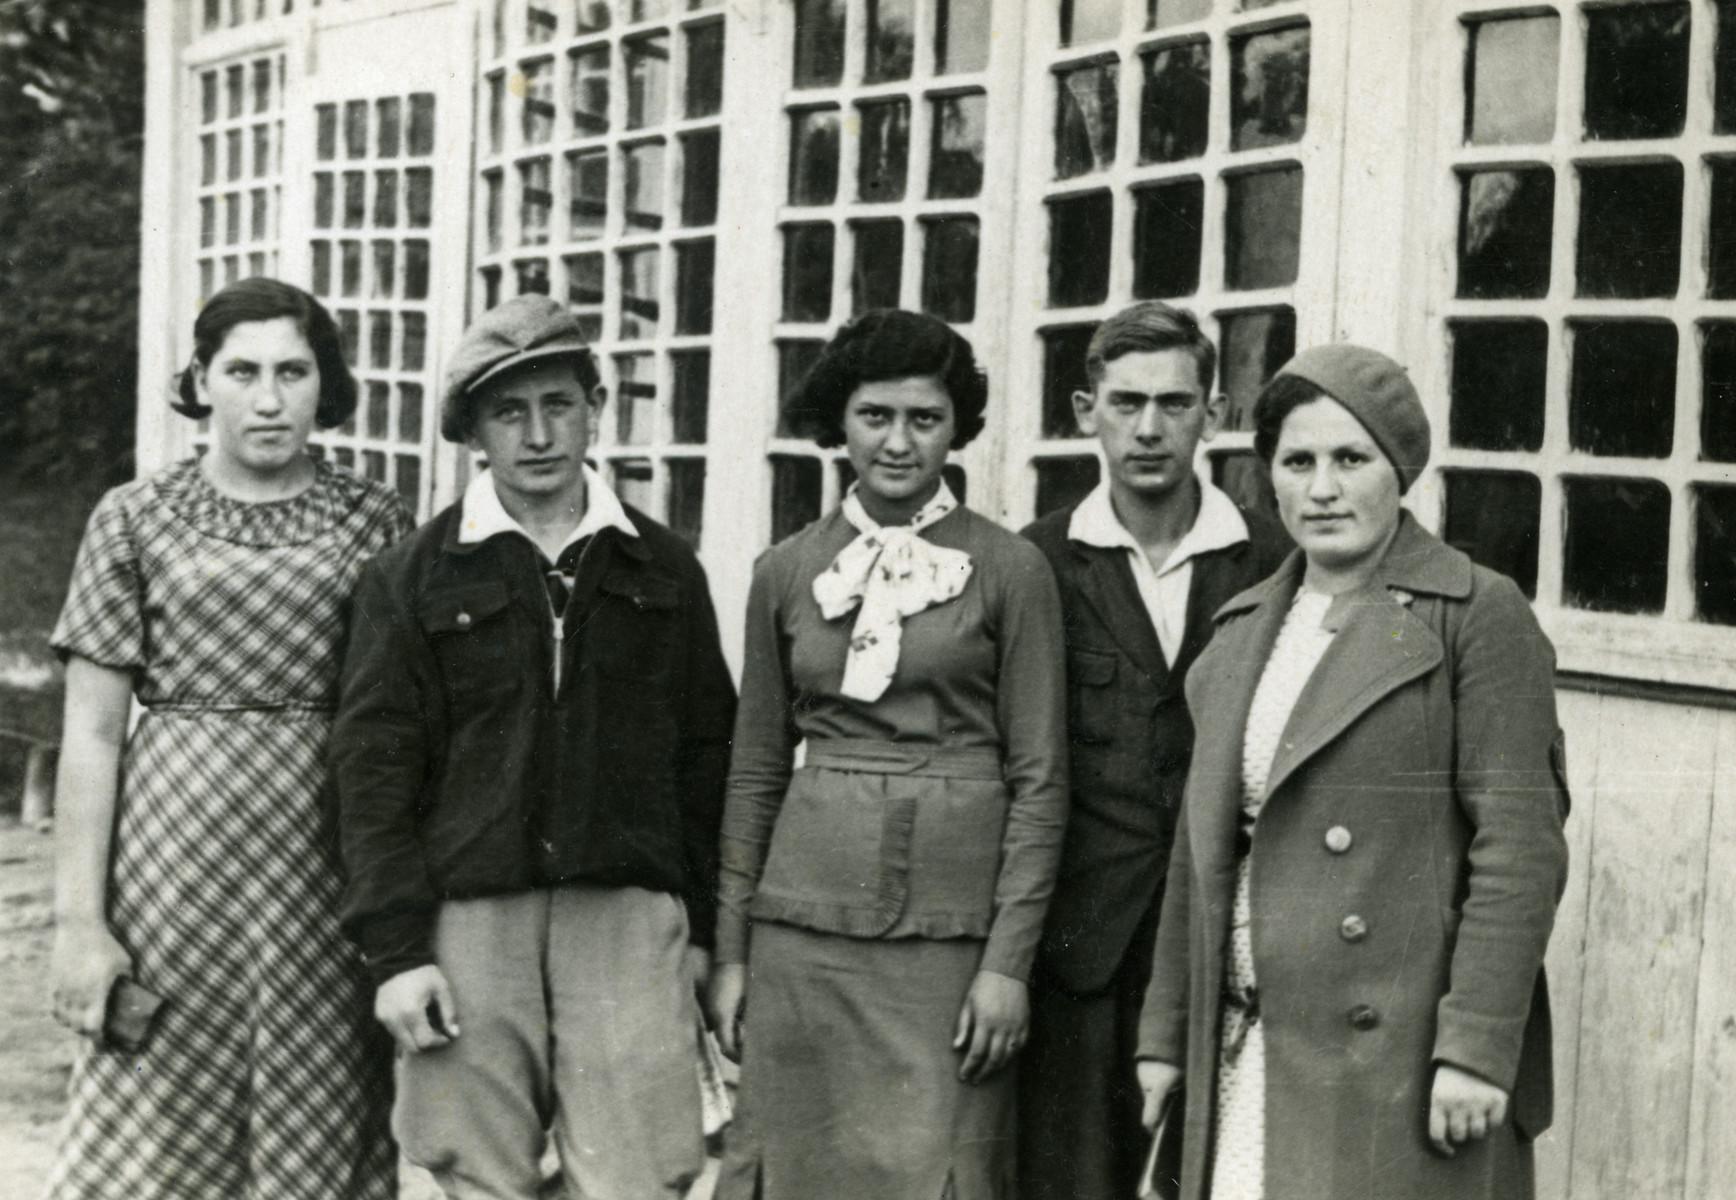 Group portrait of members of Hashomer Hatzair in Kielce.  From left to right are Dina Itskovic, Nachum Finkelstein, Sara Laks, Chaim Leichter and Sara Golemblowski.